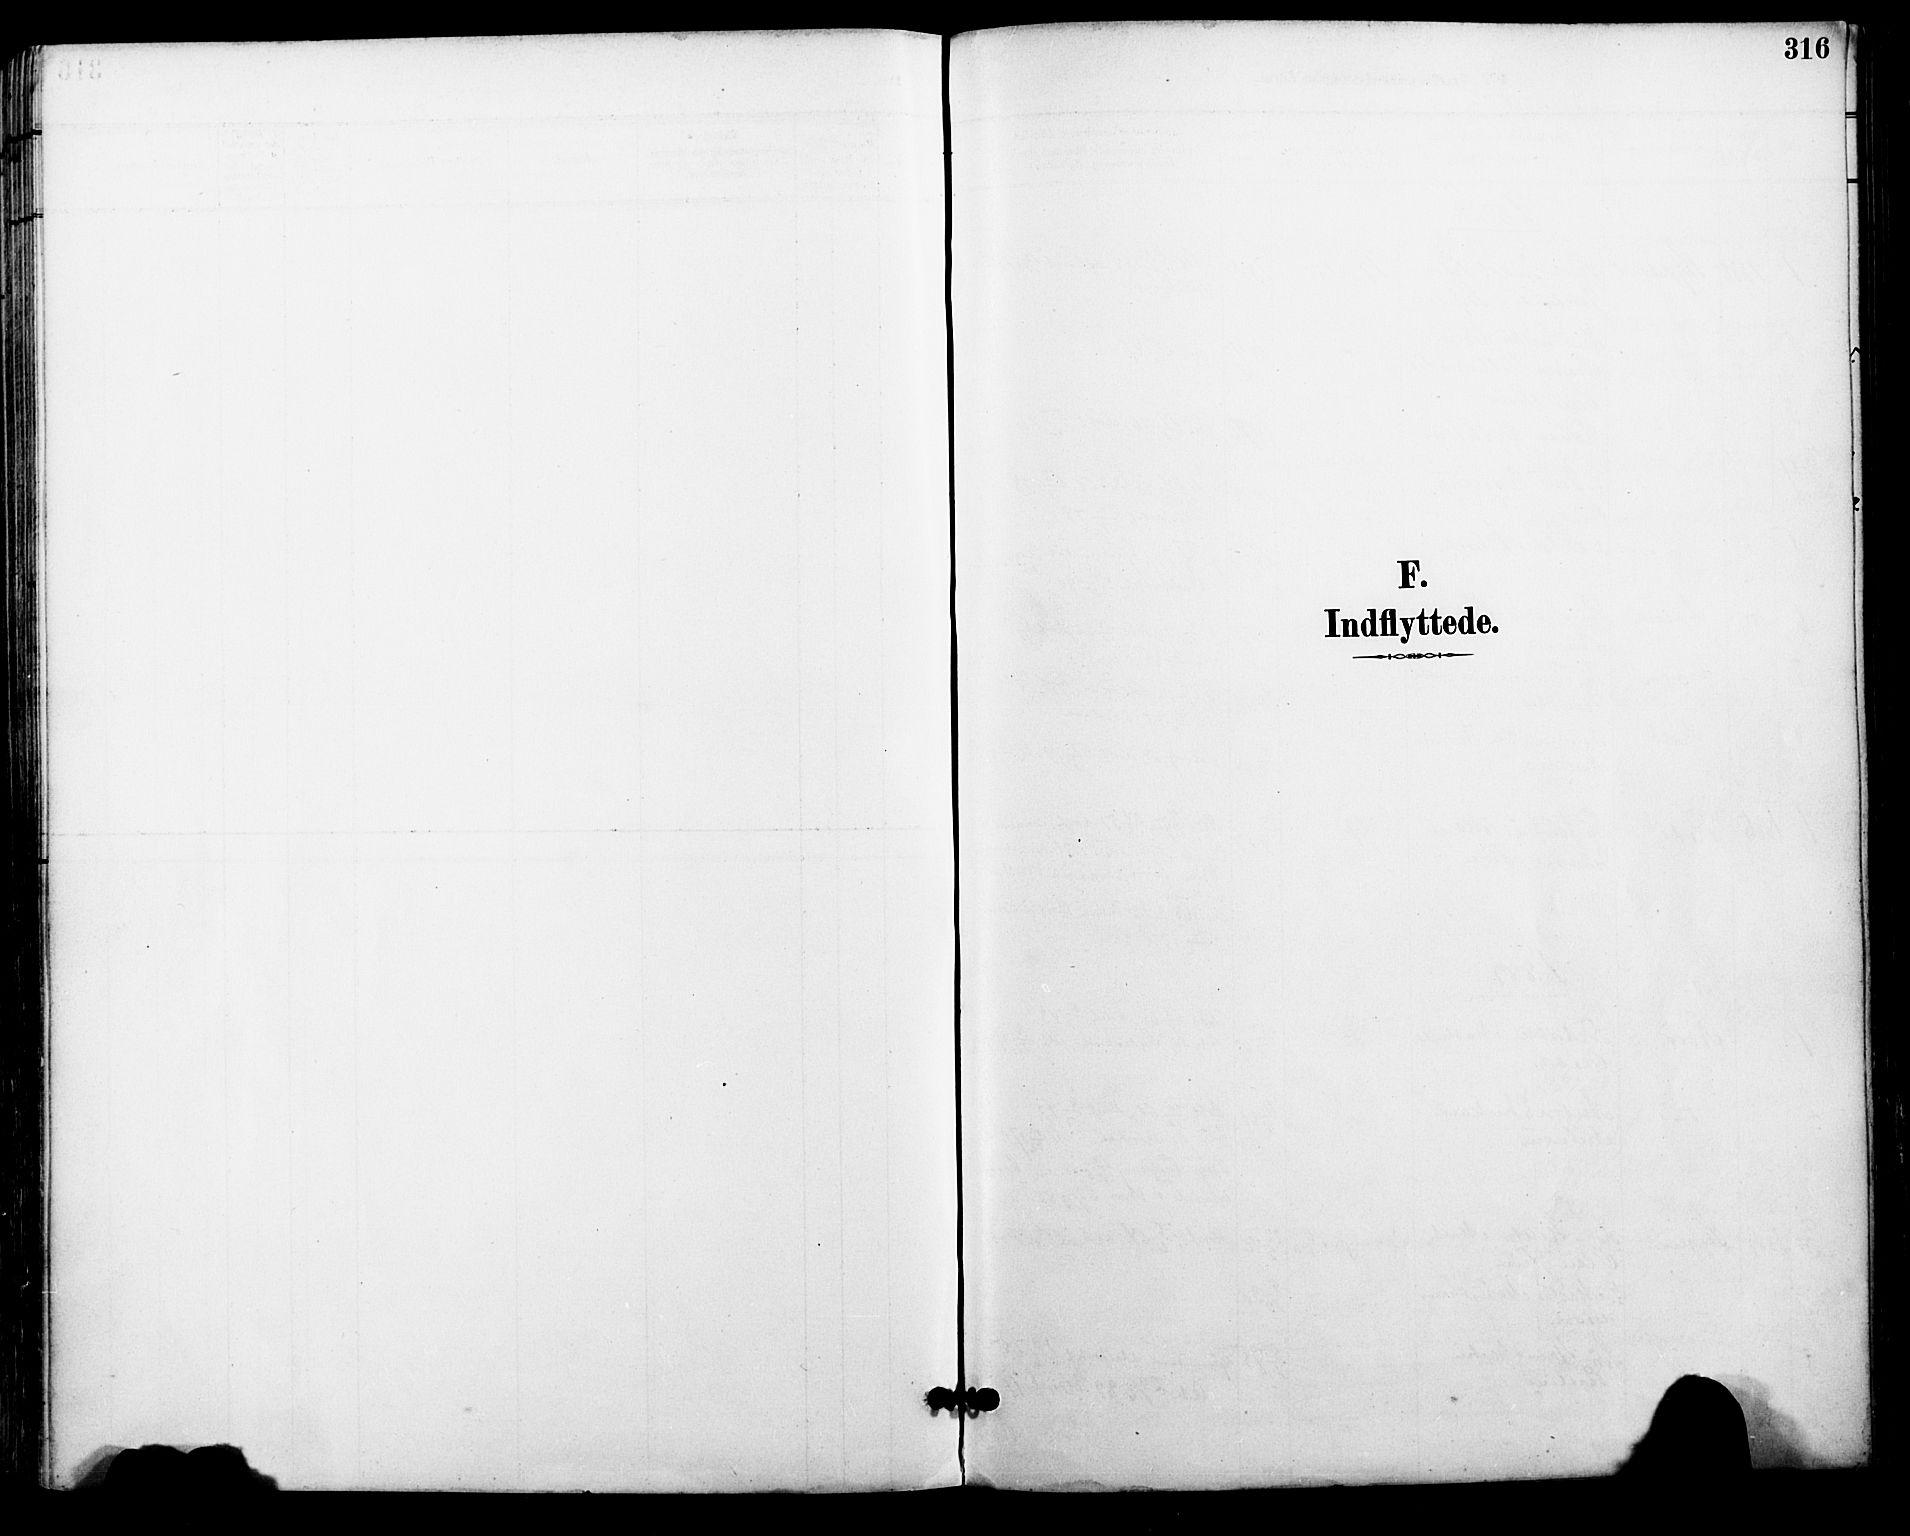 SAT, Ministerialprotokoller, klokkerbøker og fødselsregistre - Nordland, 801/L0010: Ministerialbok nr. 801A10, 1888-1899, s. 316